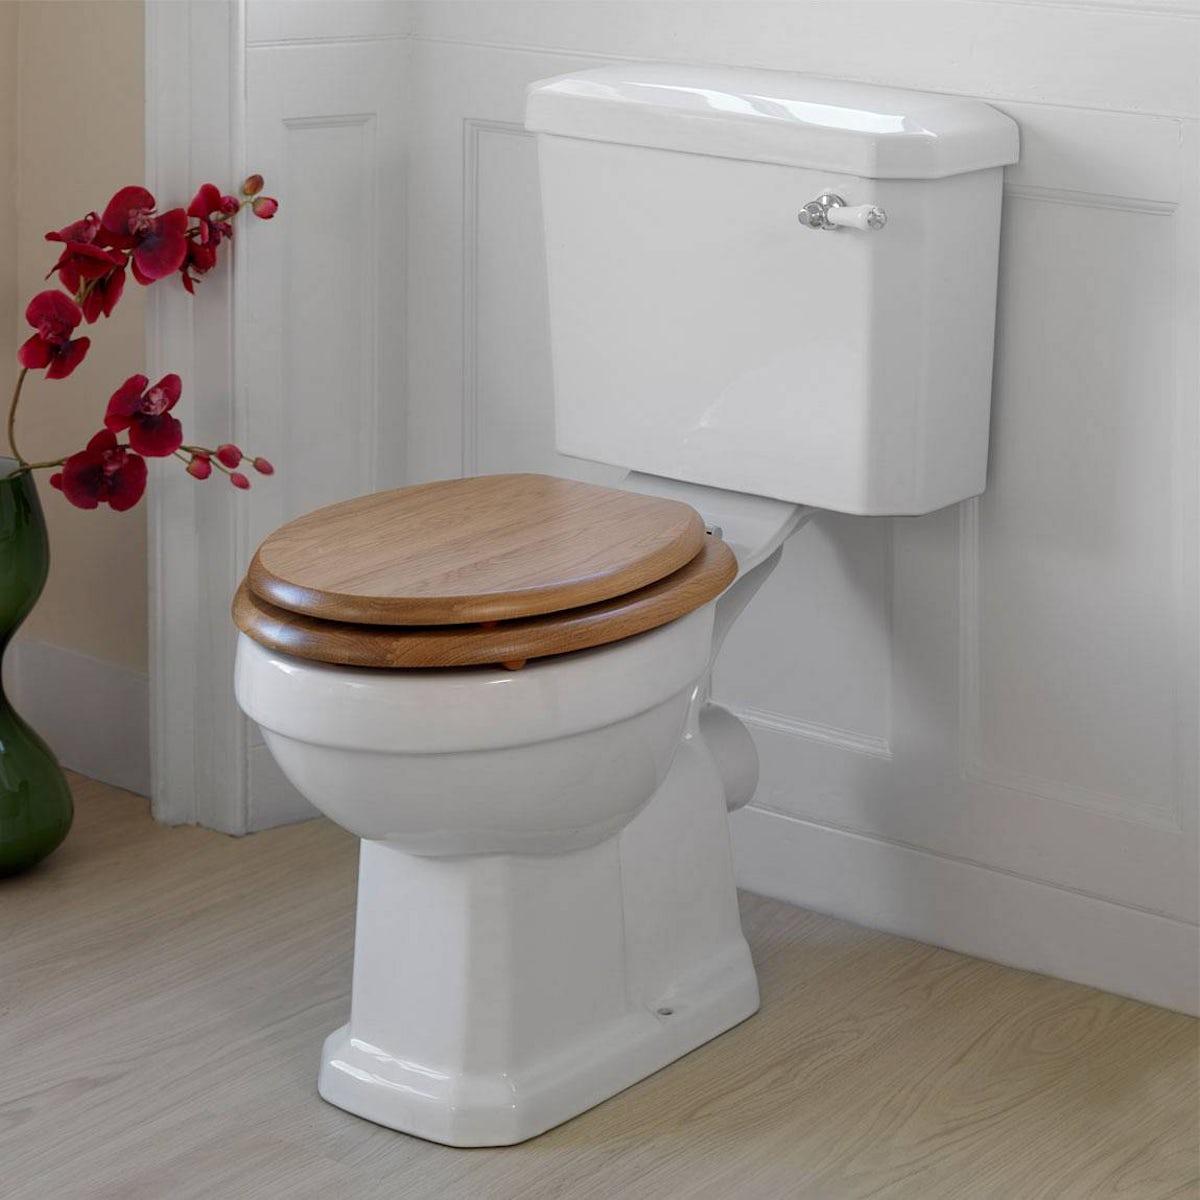 Oak wooden toilet seat for Trend toilet